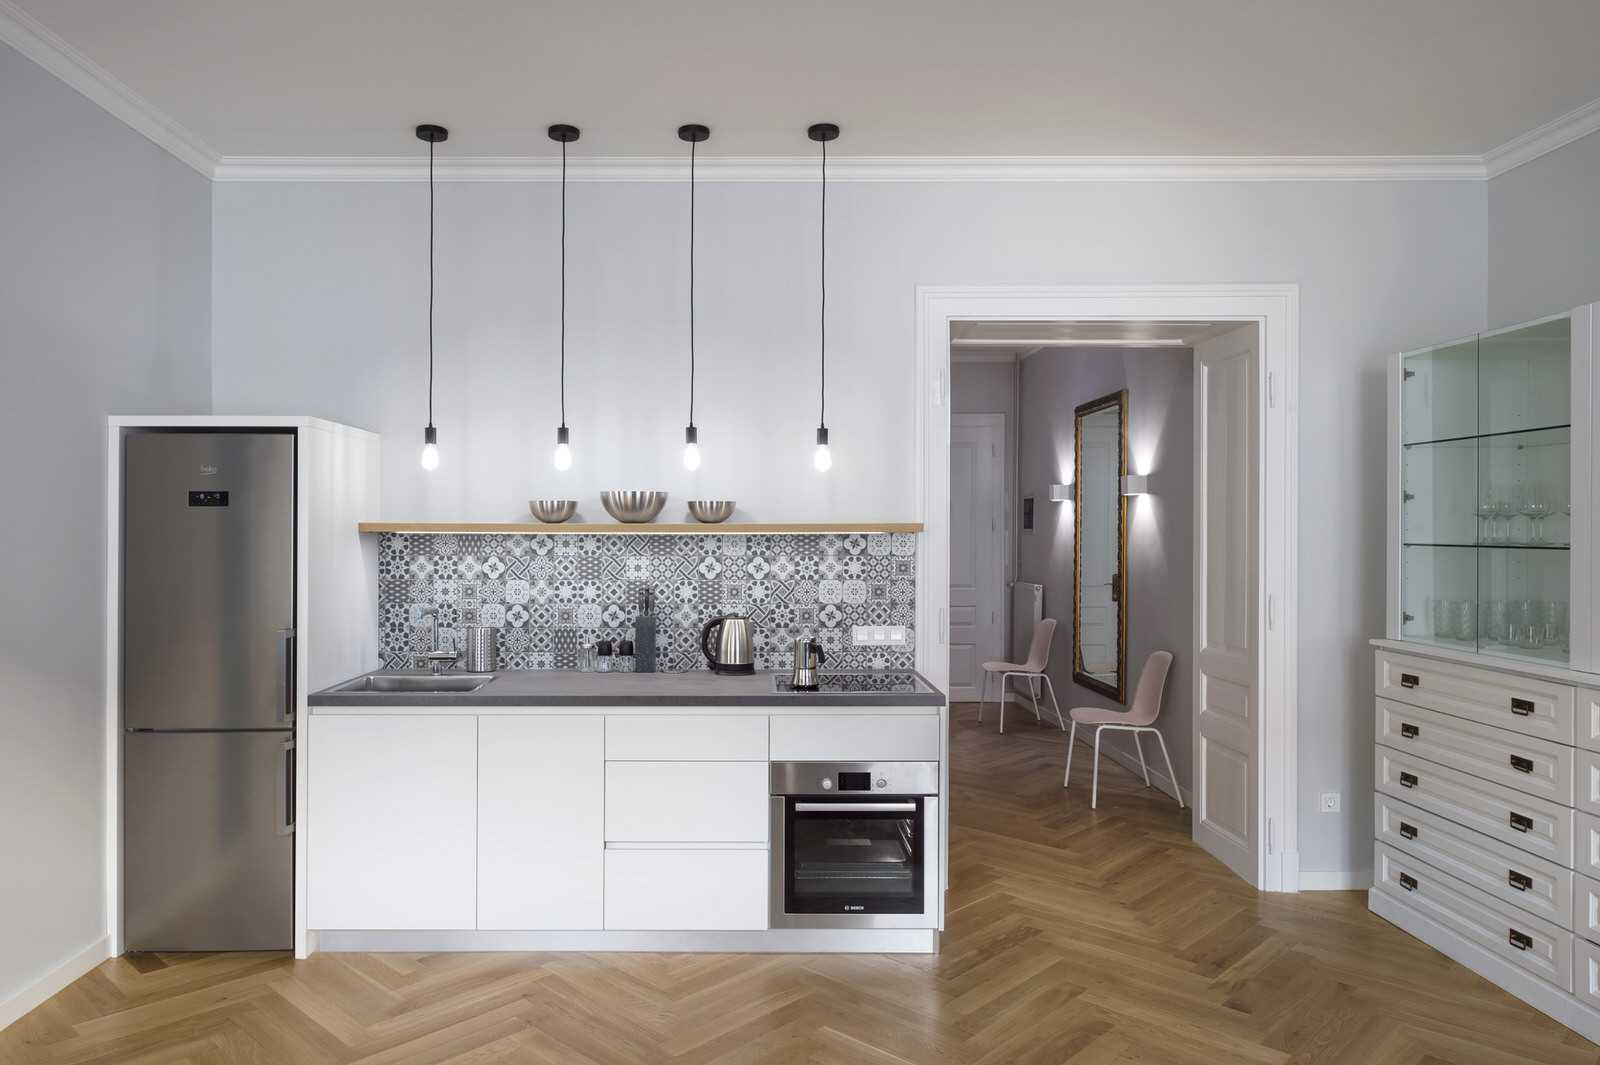 Hallway toward bathroom and bedroom of Ljubljana rental apartment